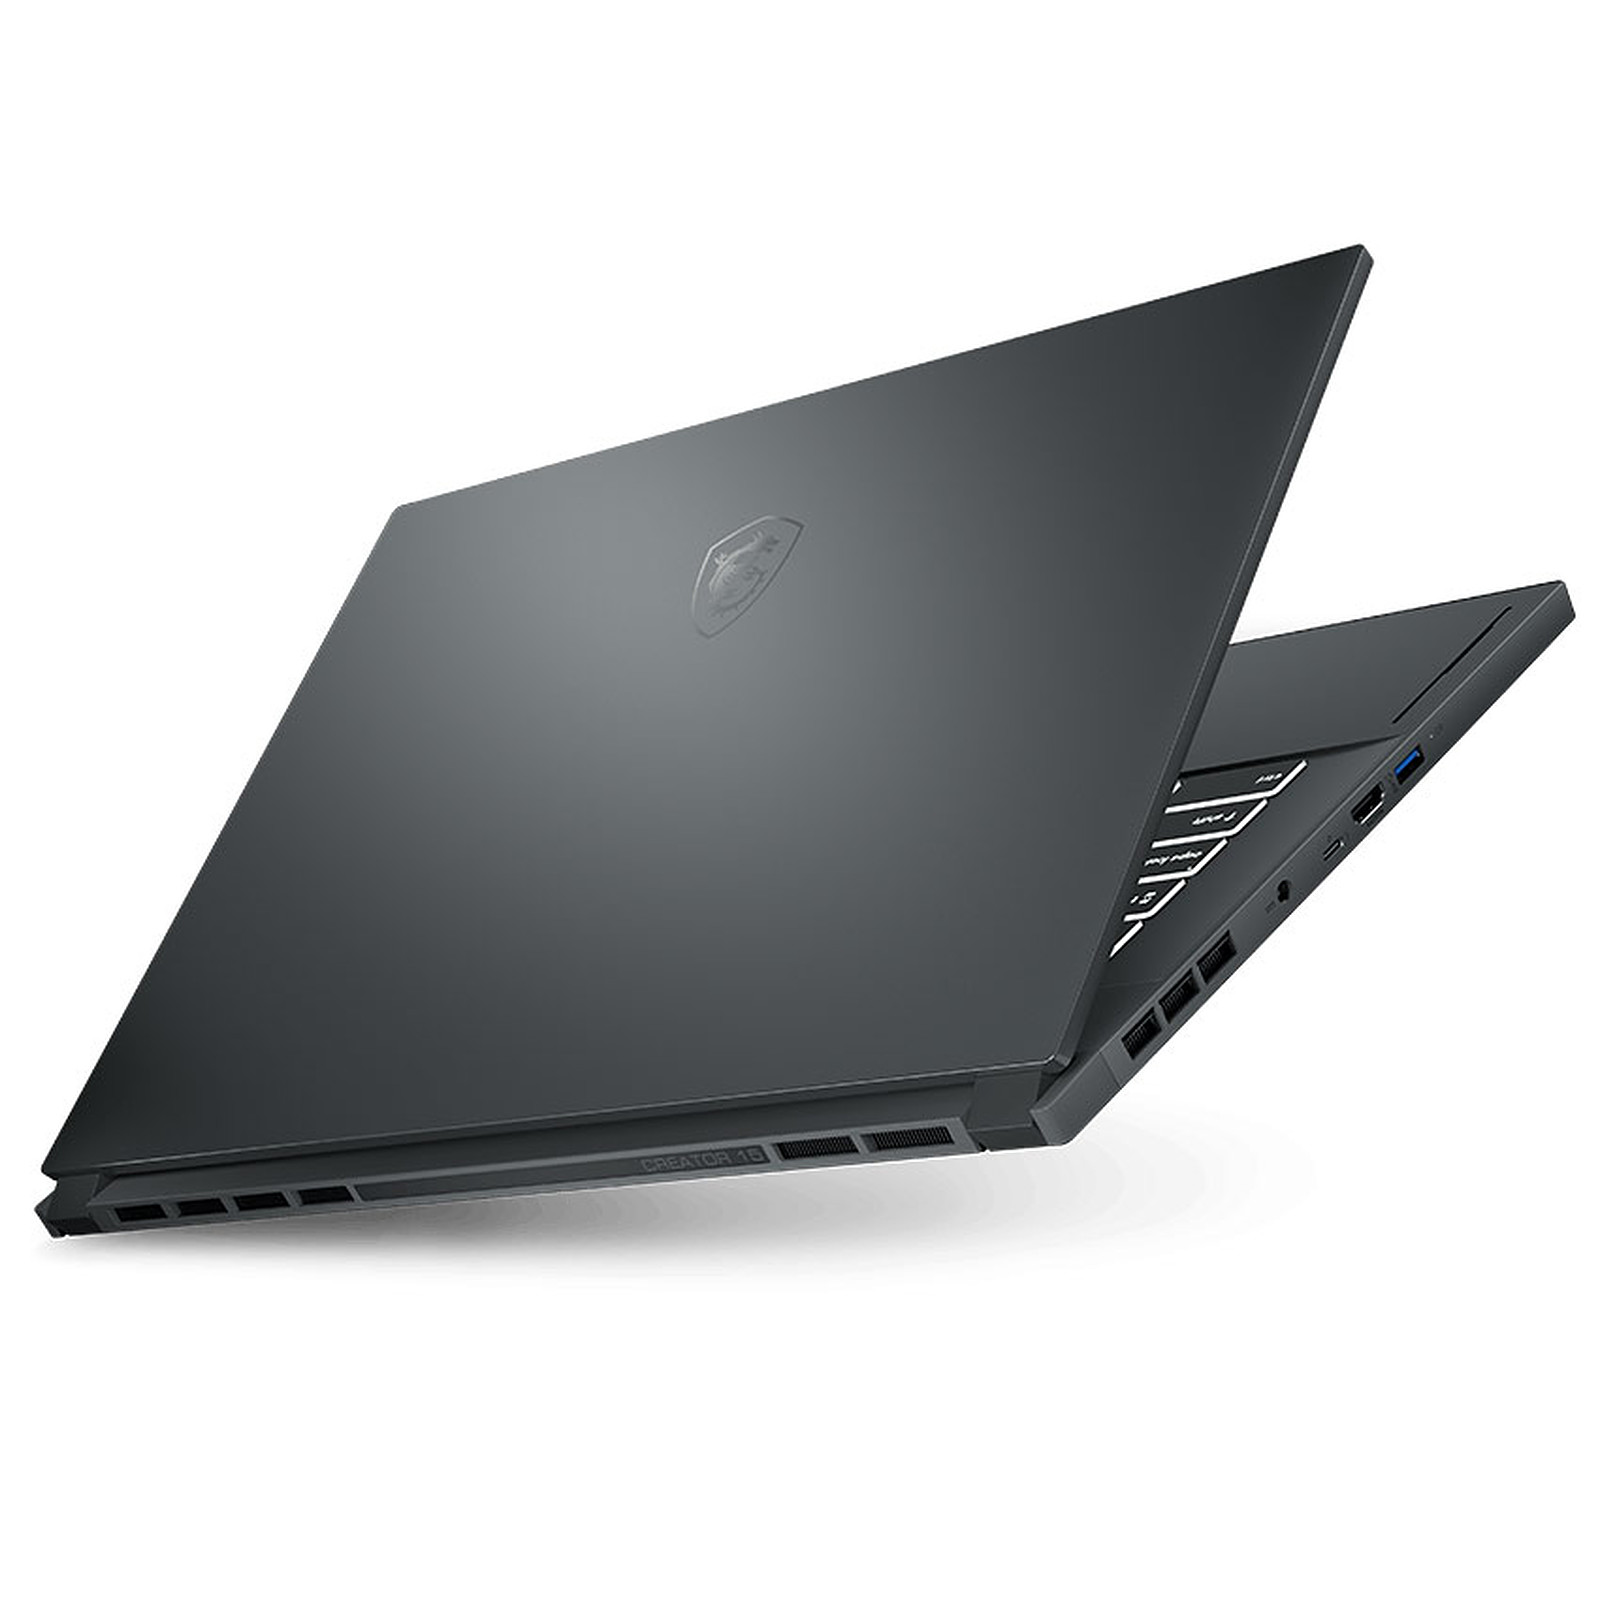 PC Creator 15 A10UH-085FR MSI